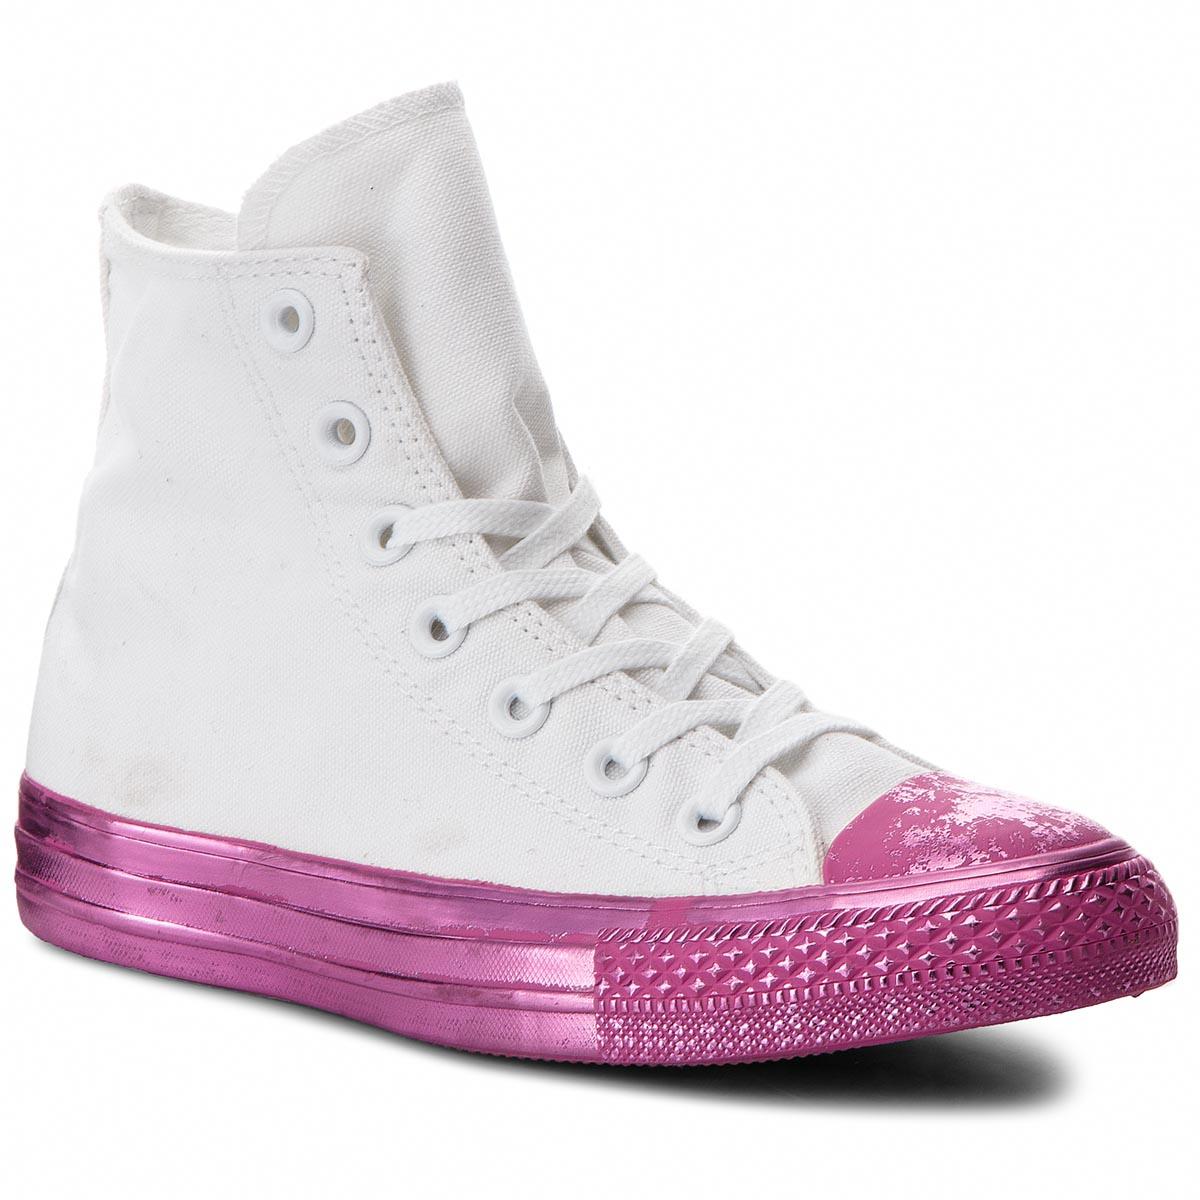 Plátěnky CONVERSE - Ctas Hi 156768C White Pink Black - Glami.cz abdb314d52